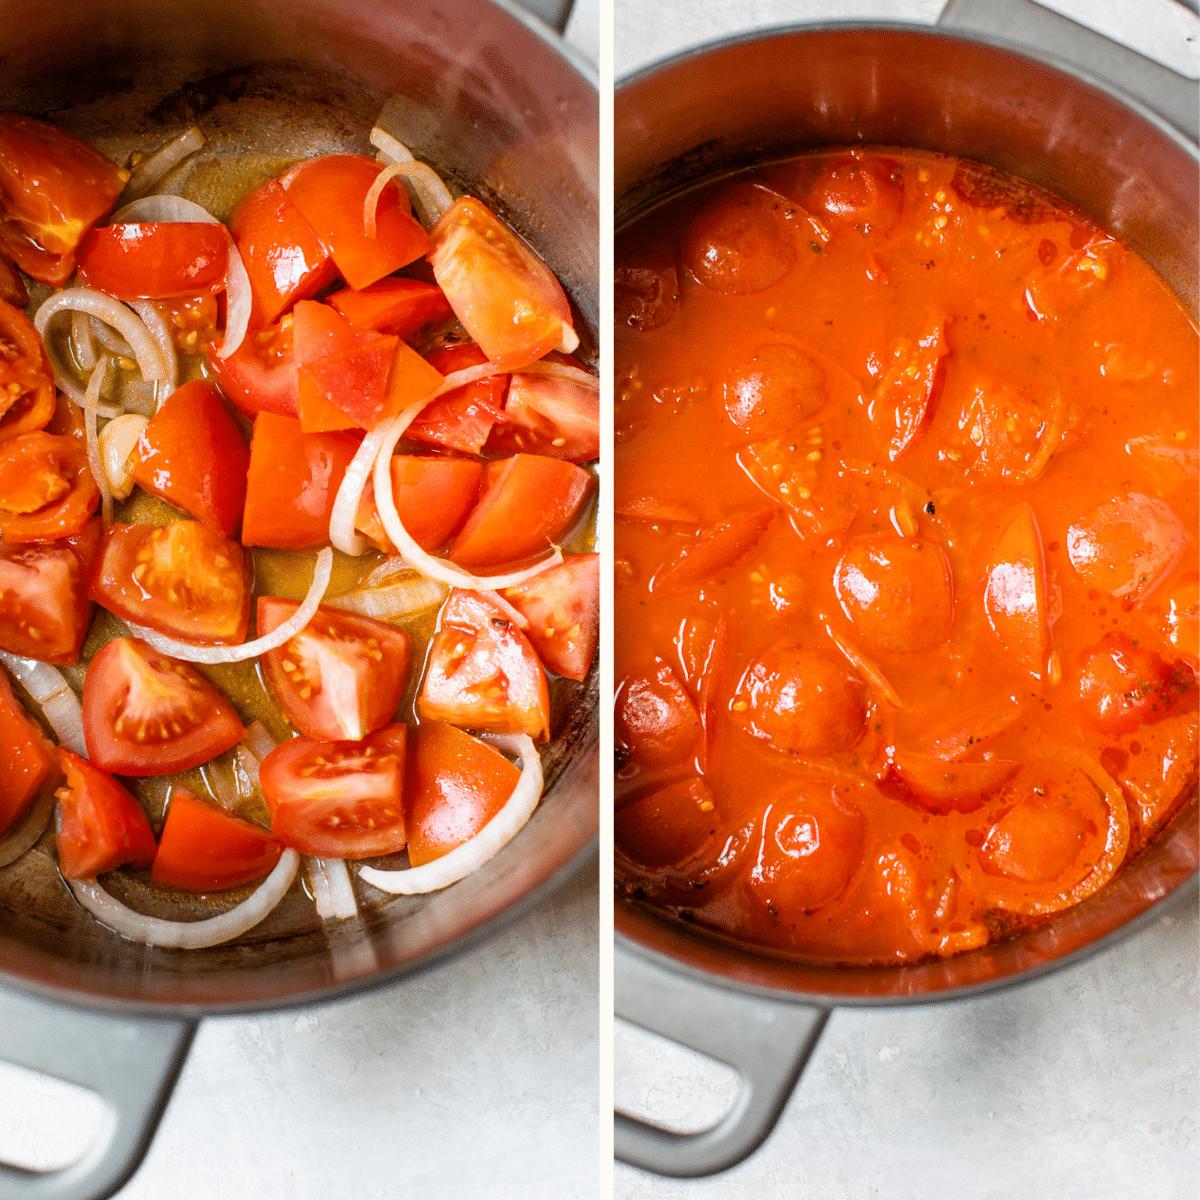 tomato soup in a saucepan